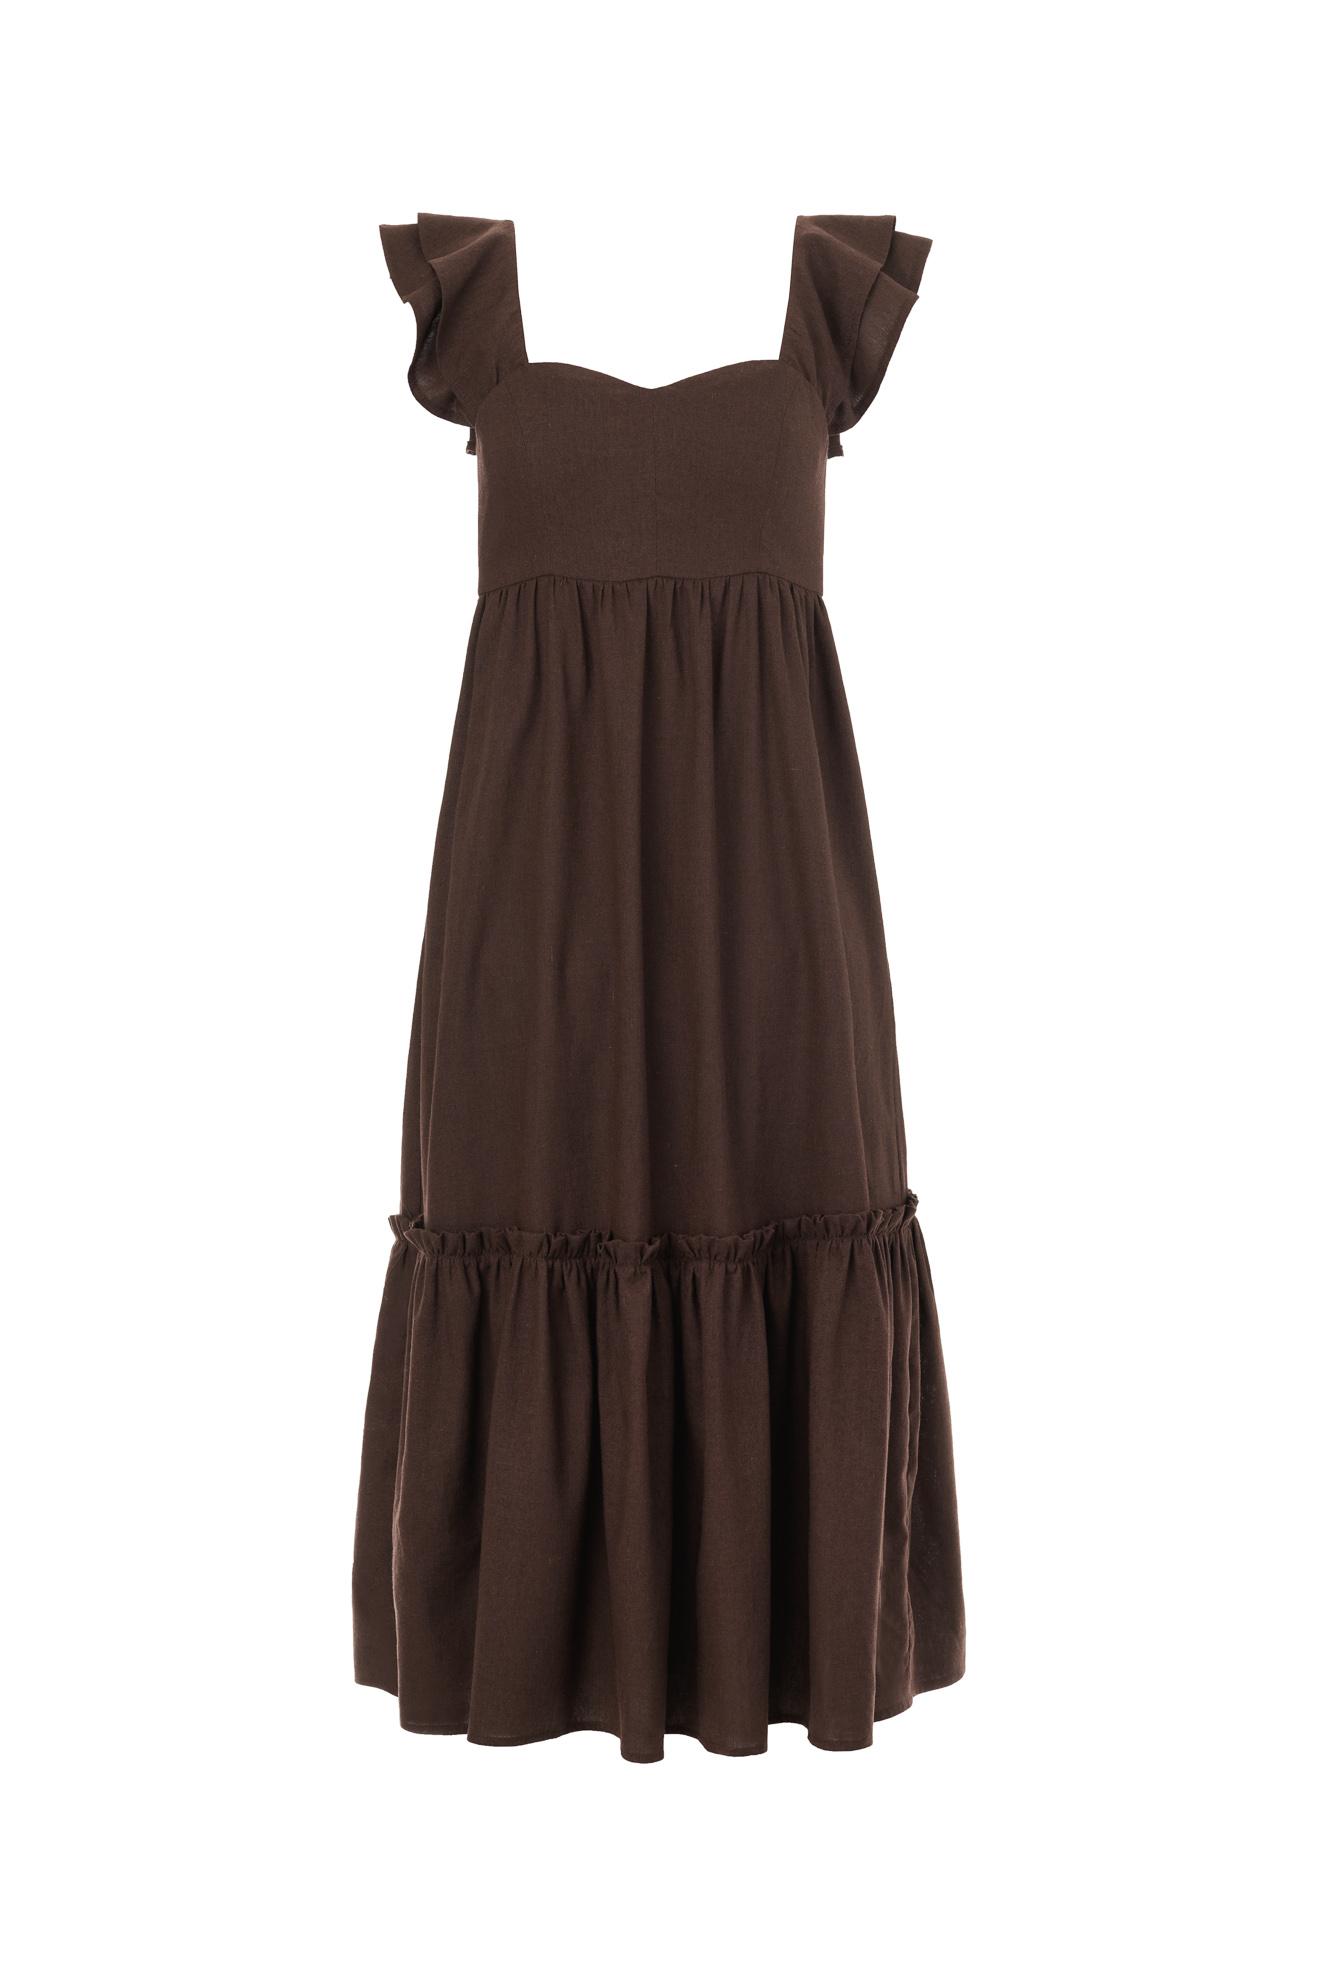 Gloria dress summer collection